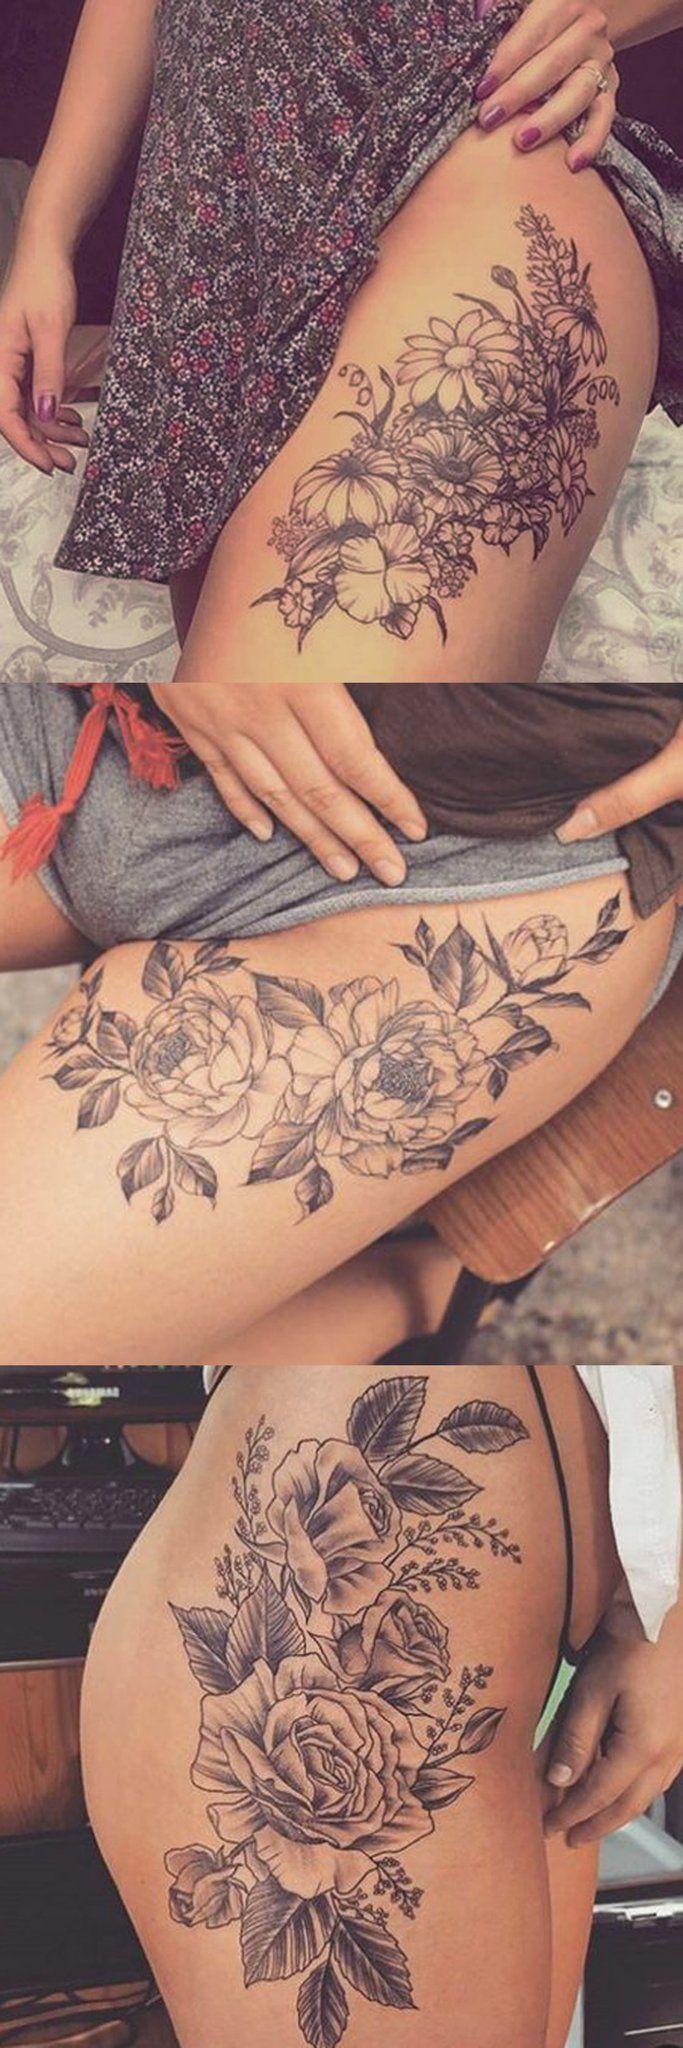 Photo of Wild Rose Thigh Tattoo Ideas at MyBodiArt.com – Delicate Floral Flower Leg Tatt …